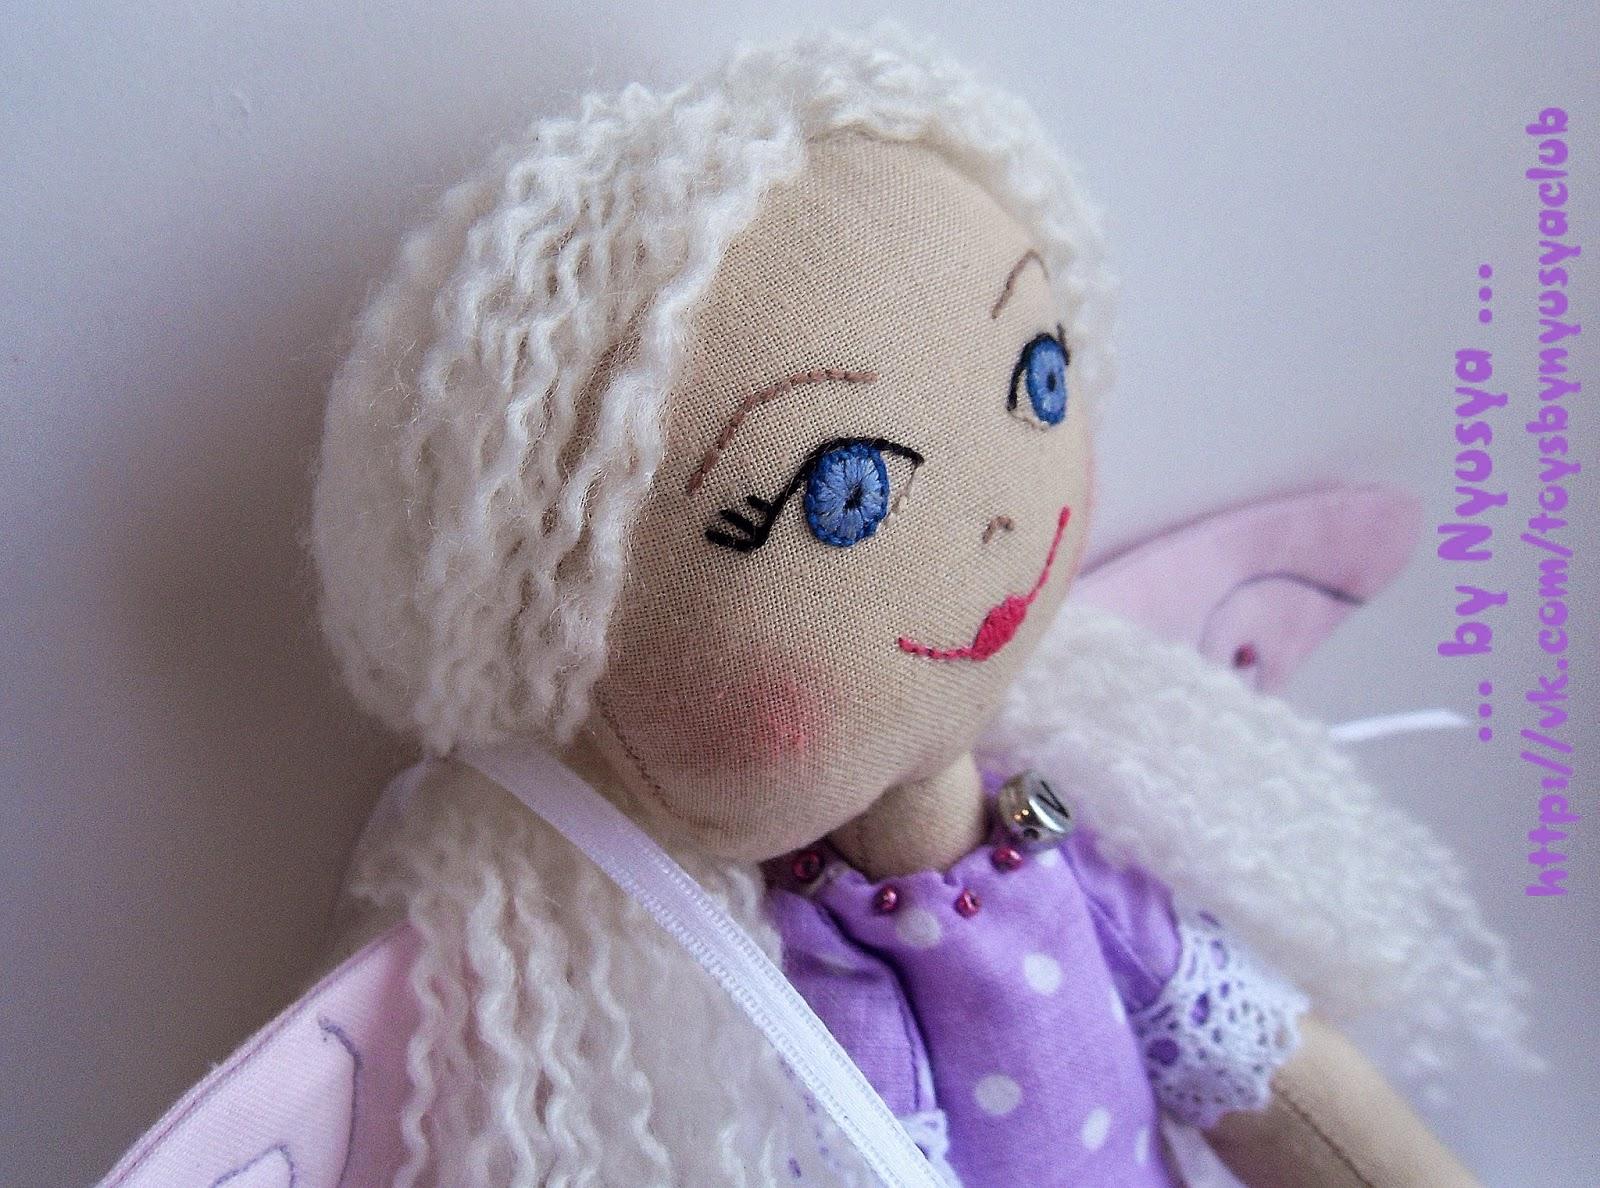 вышитое лицо у куклы